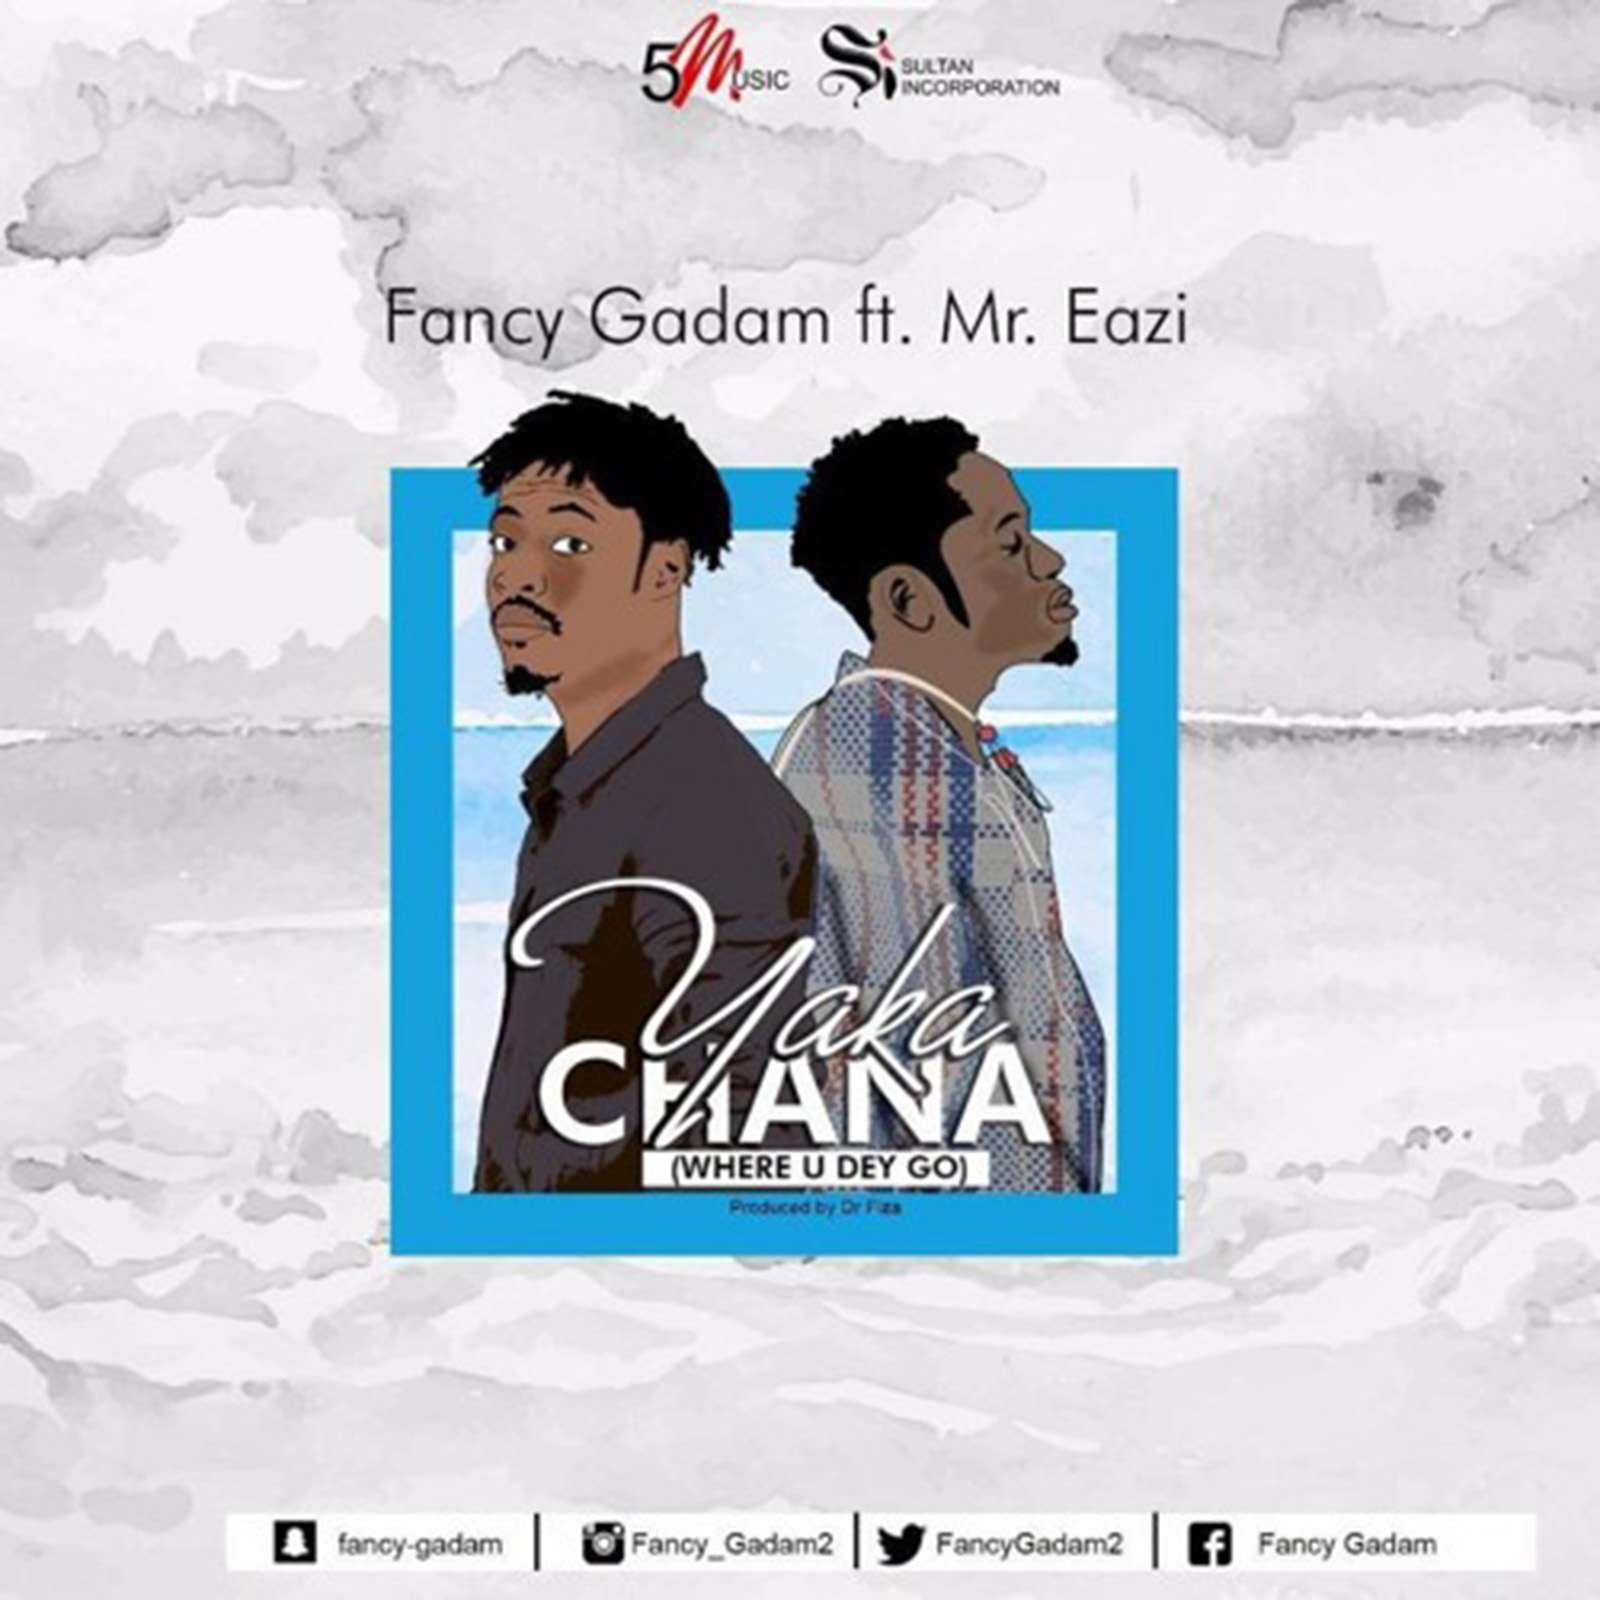 Yakachana by Fancy Gadam feat. Mr. Eazi